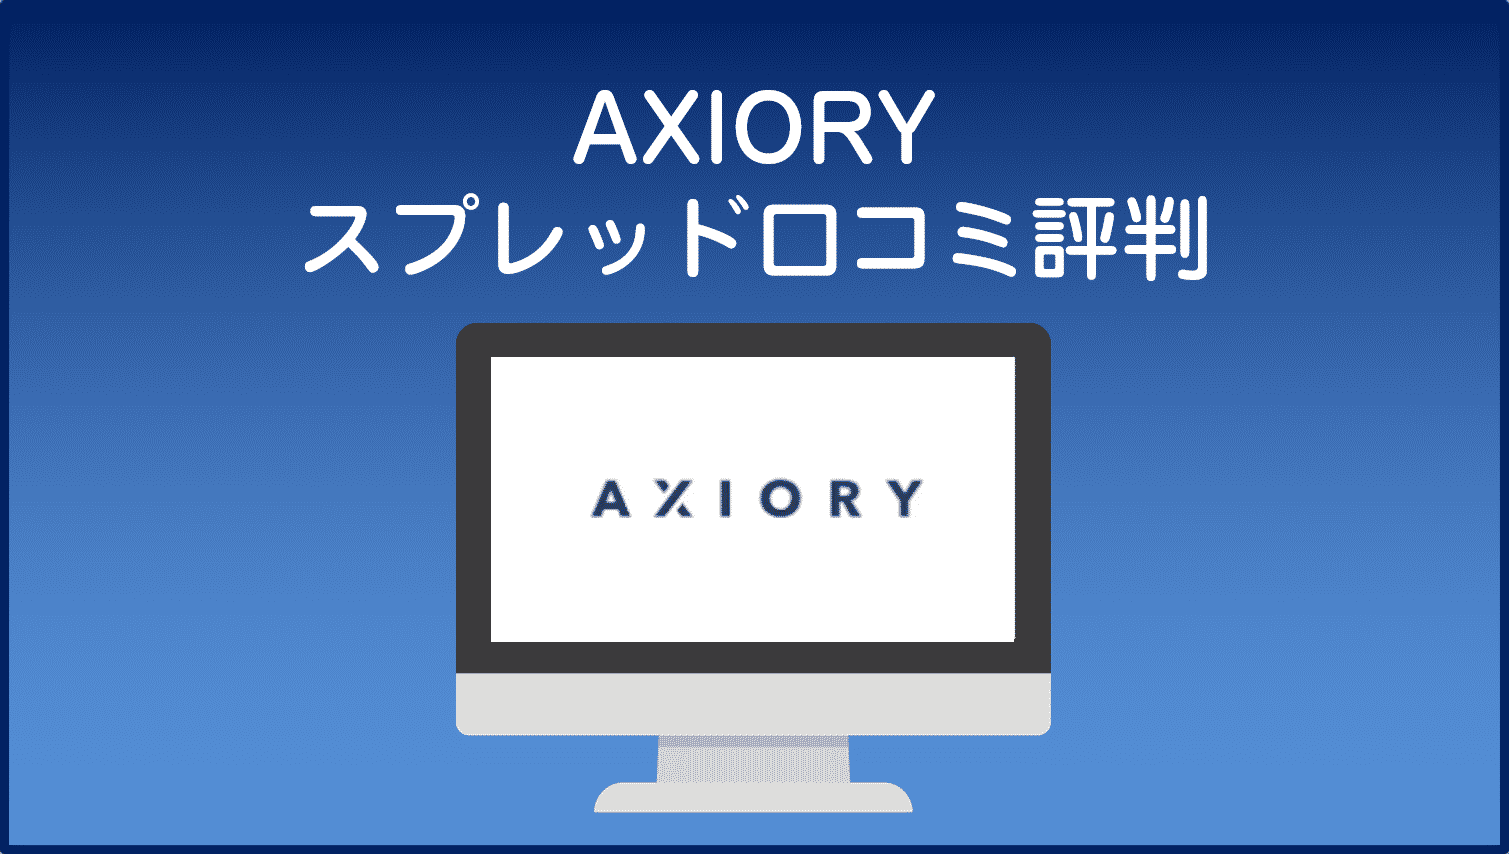 AXIORYスプレッド口コミ・評判